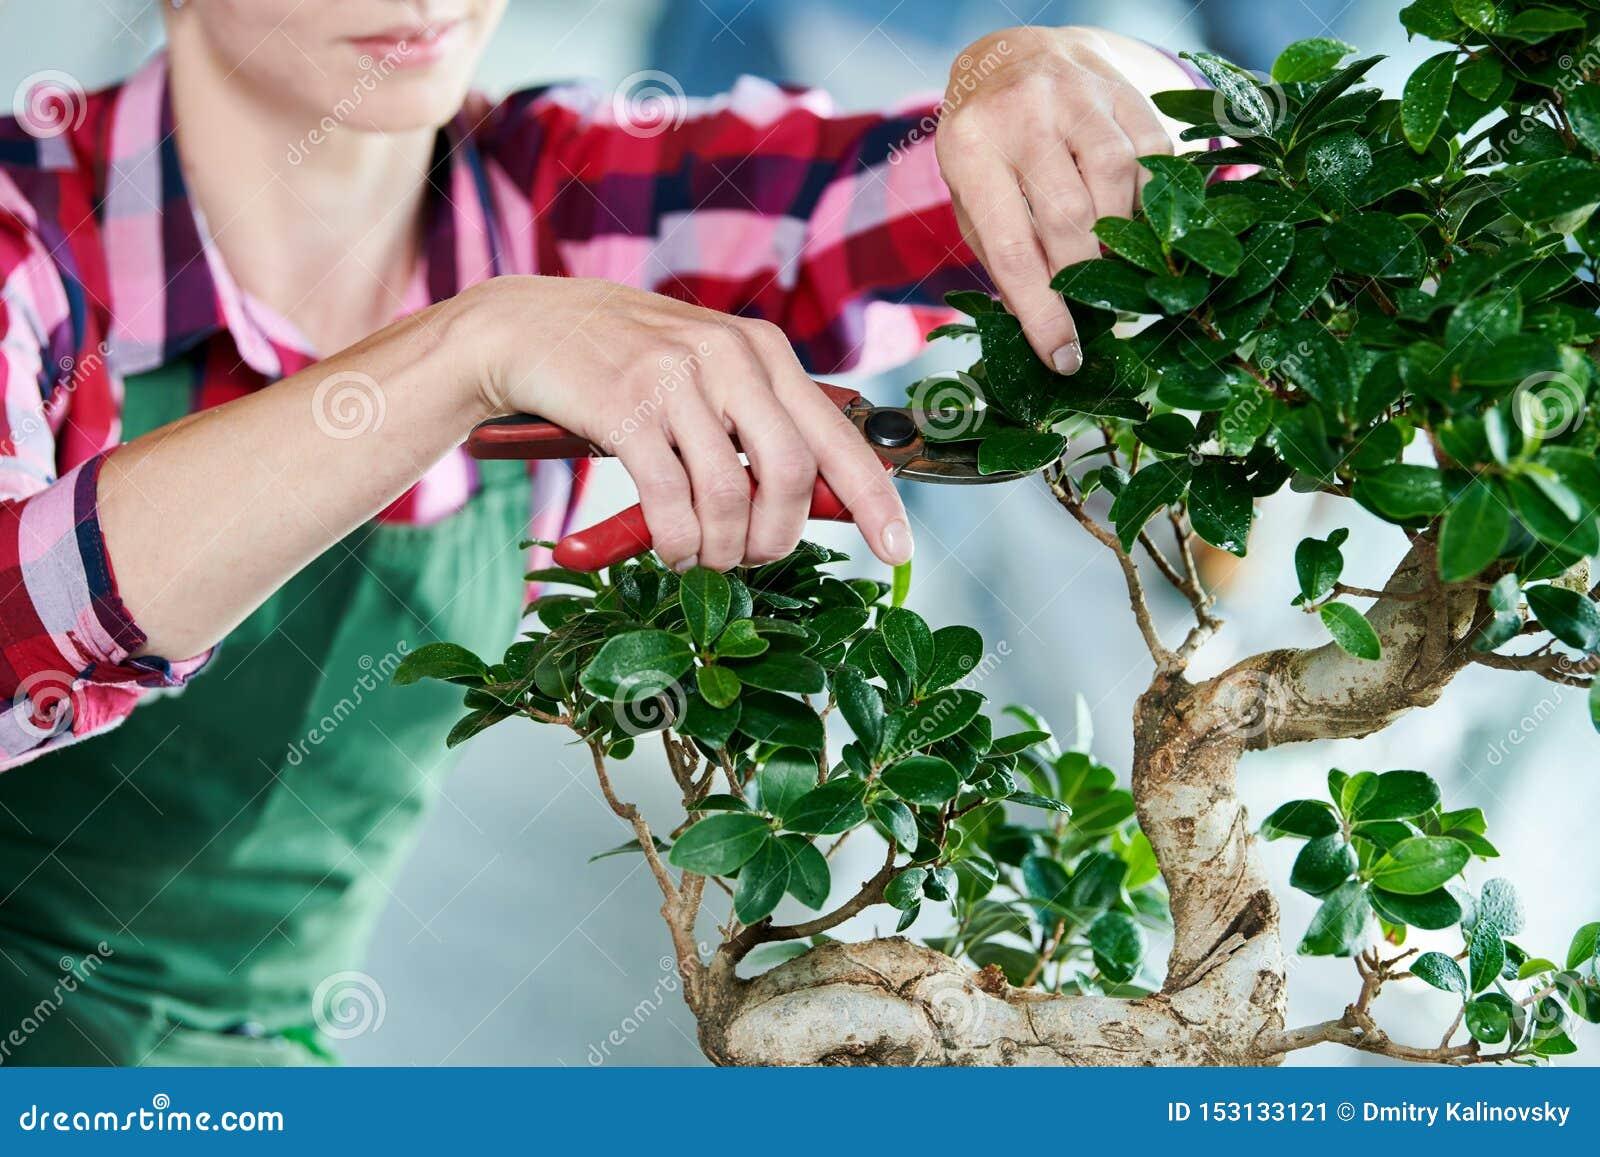 Bonsai. tending houseplant growth. Pruning small tree.